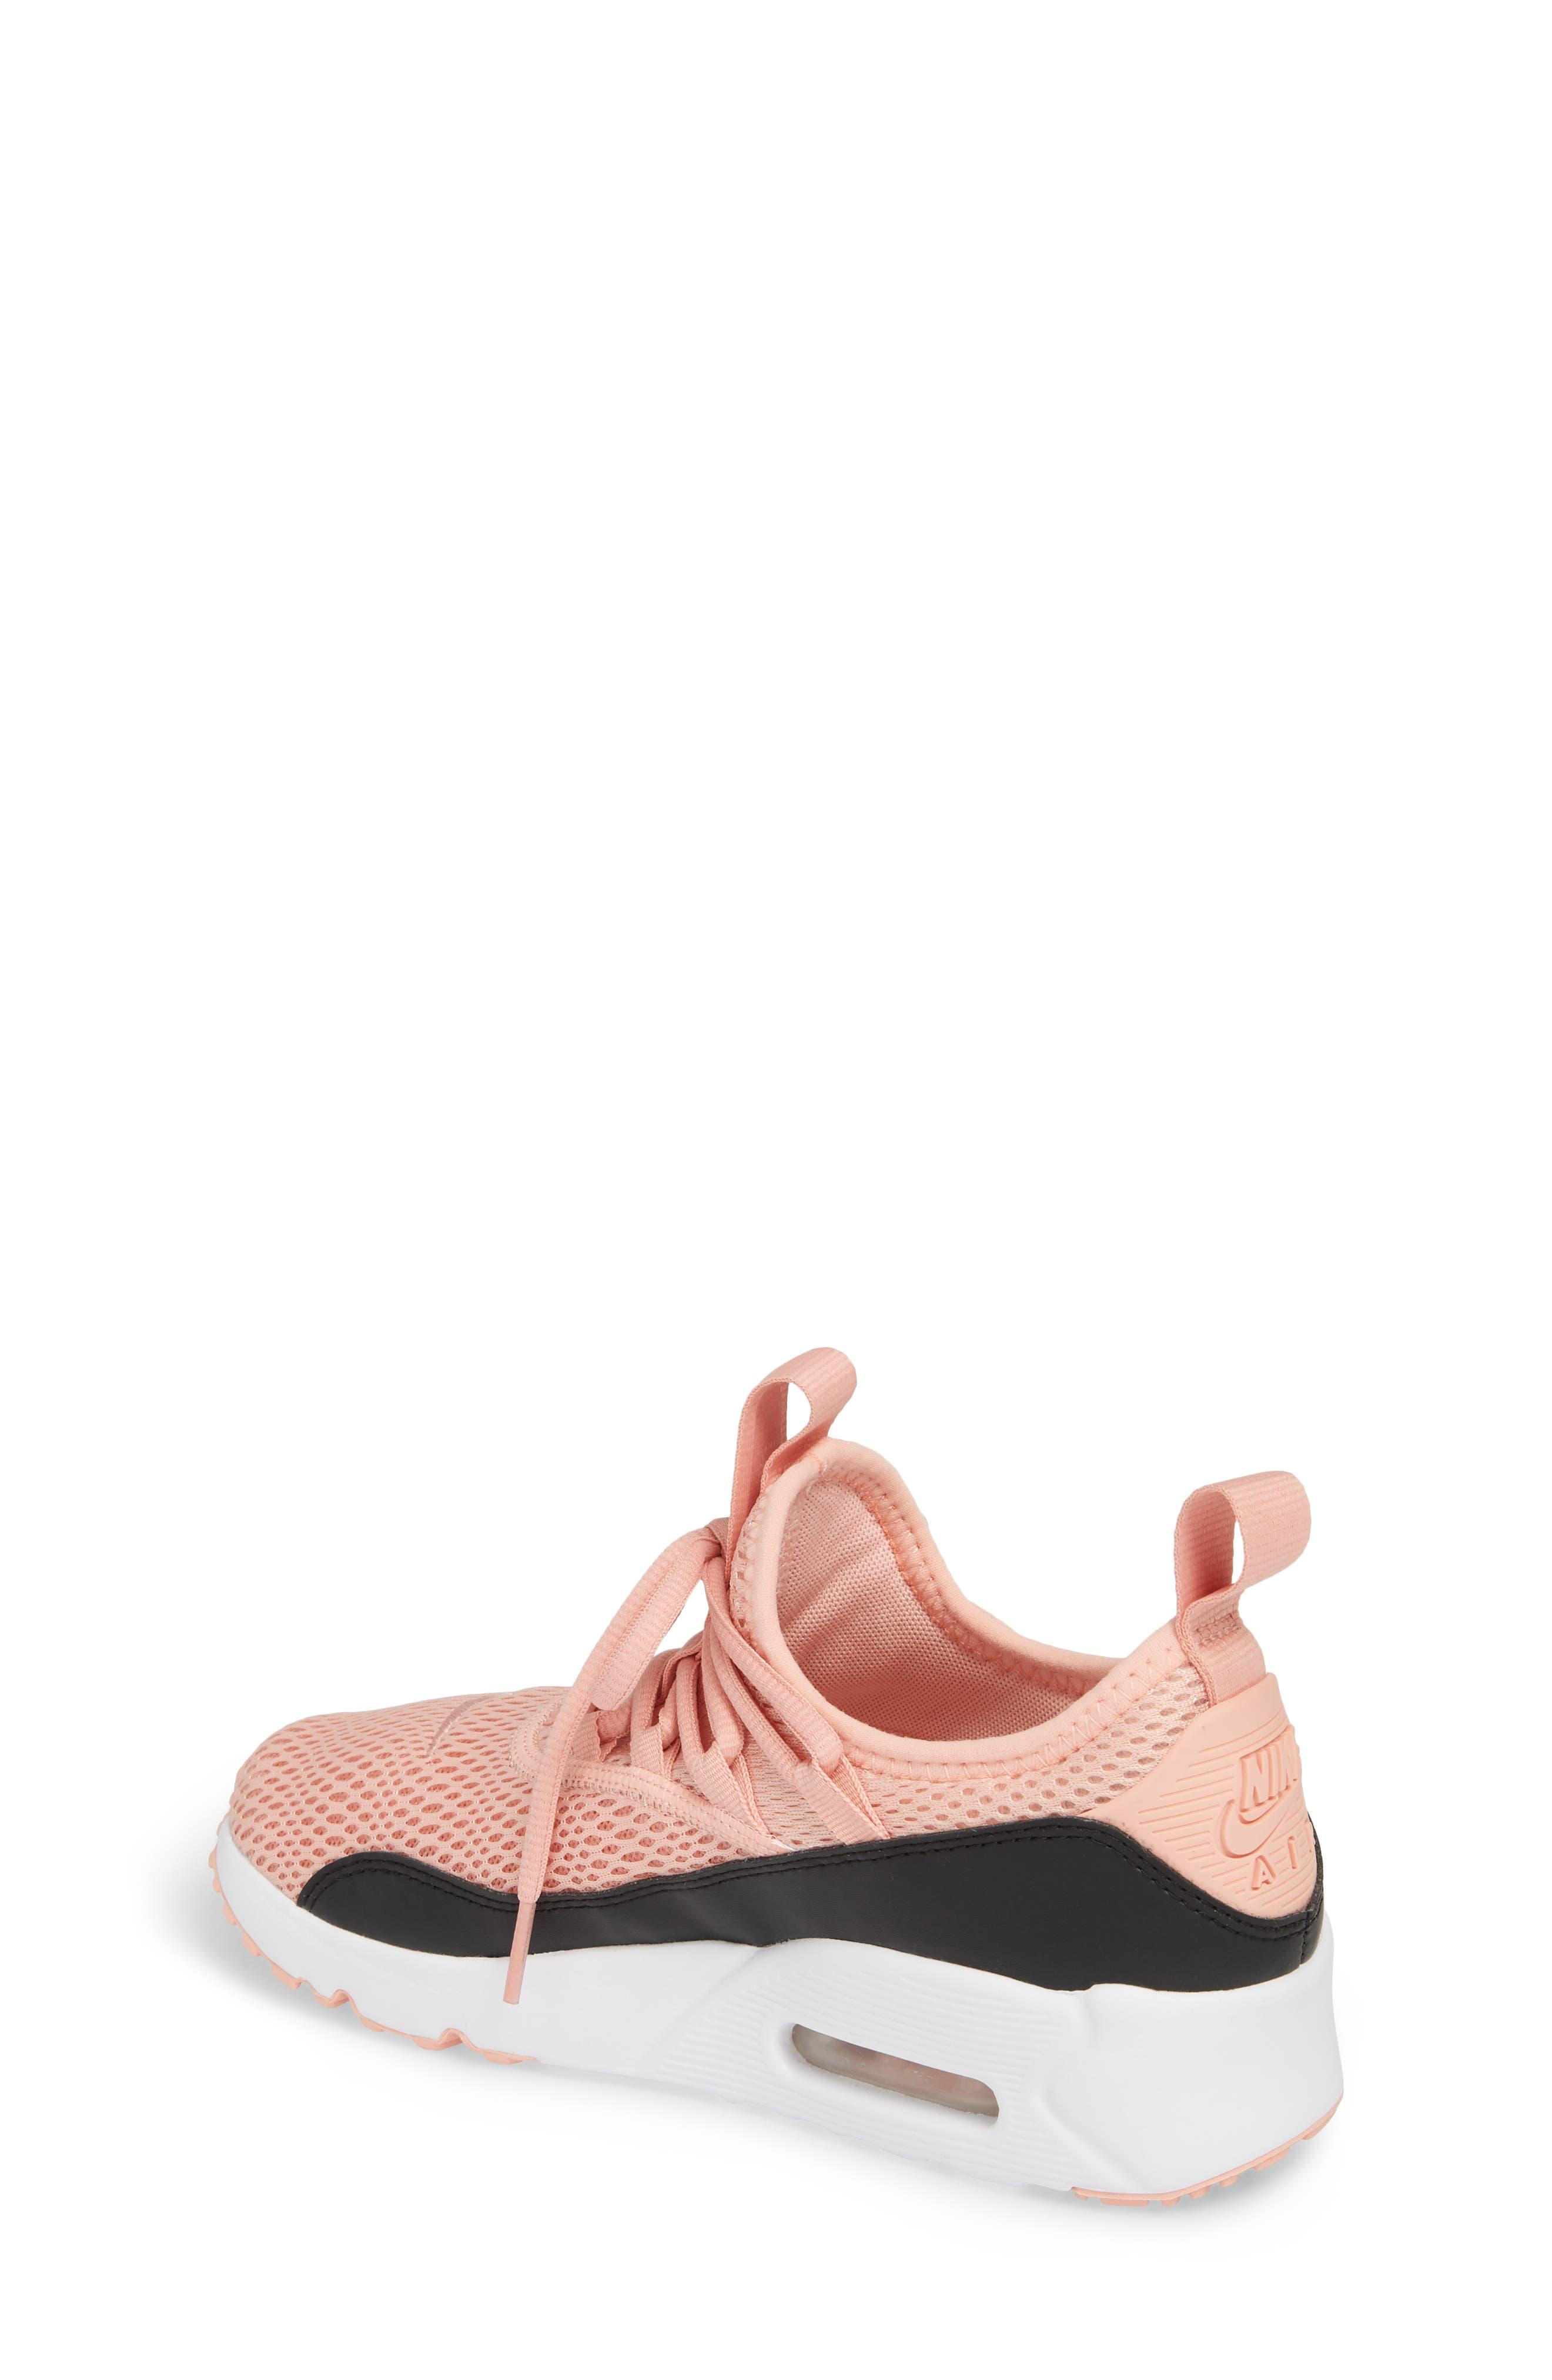 Air Max 90 EZ Sneaker,                             Alternate thumbnail 2, color,                             Coral Stardust/ Black